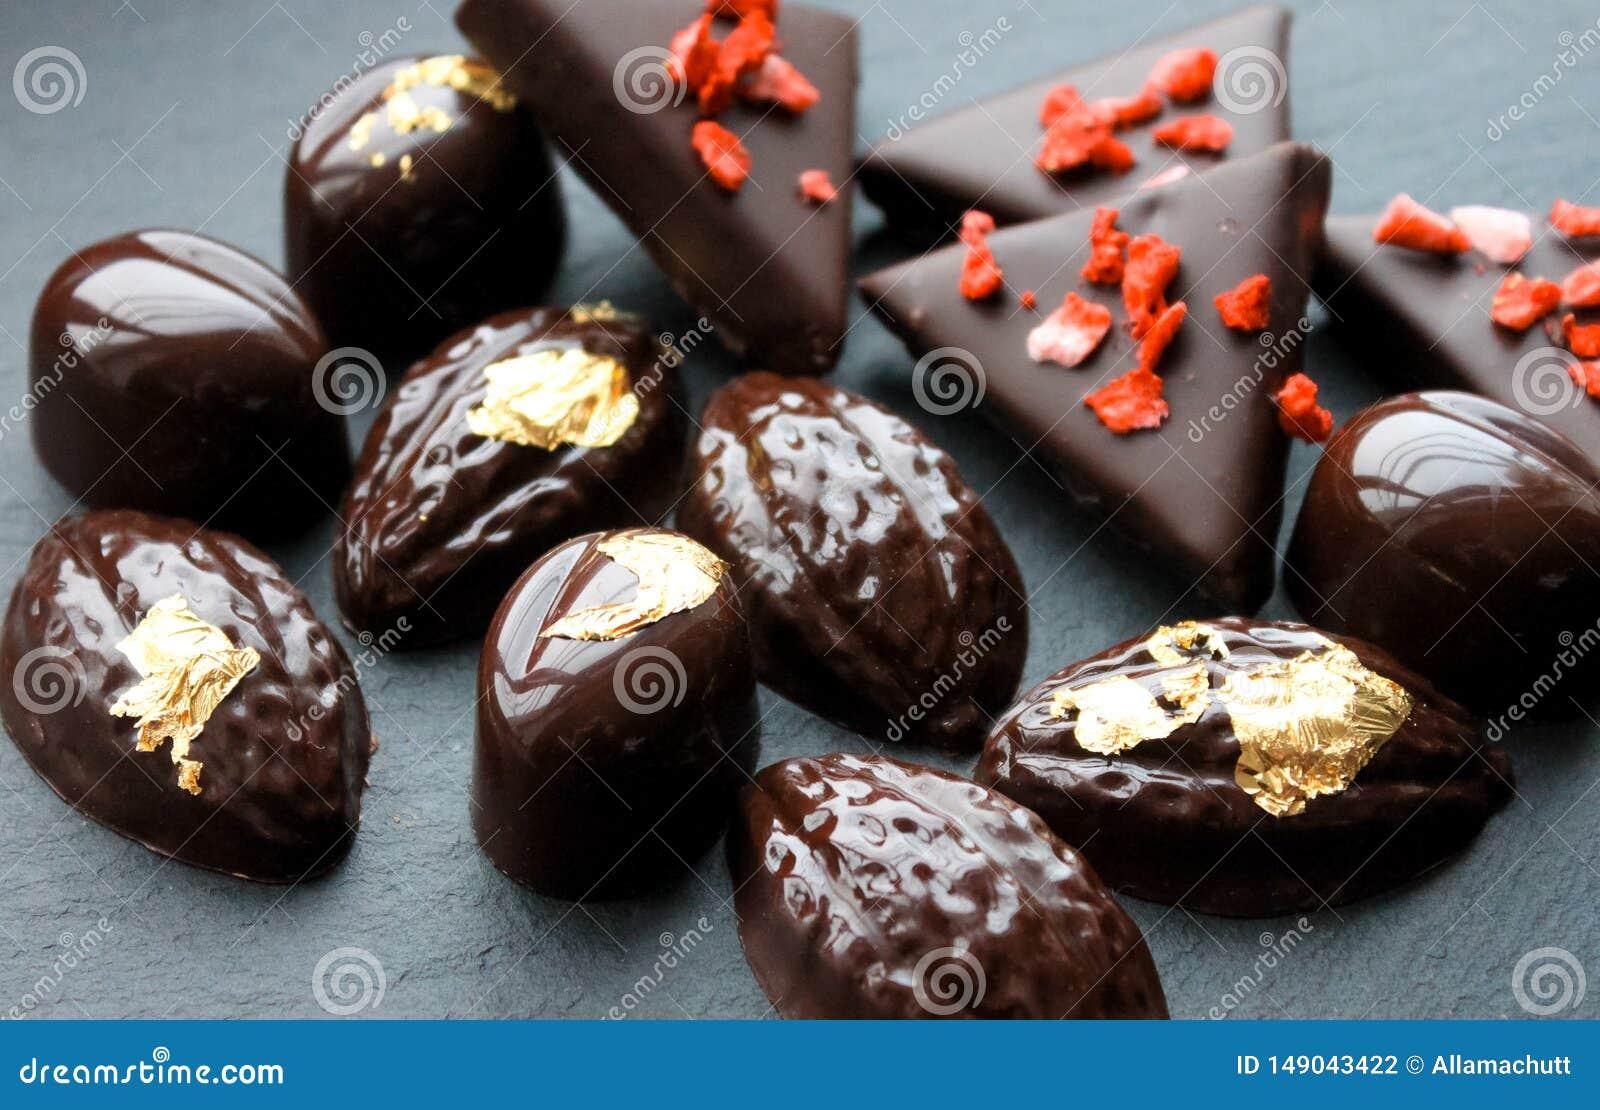 Dunkle Schokoladen-Pralinen